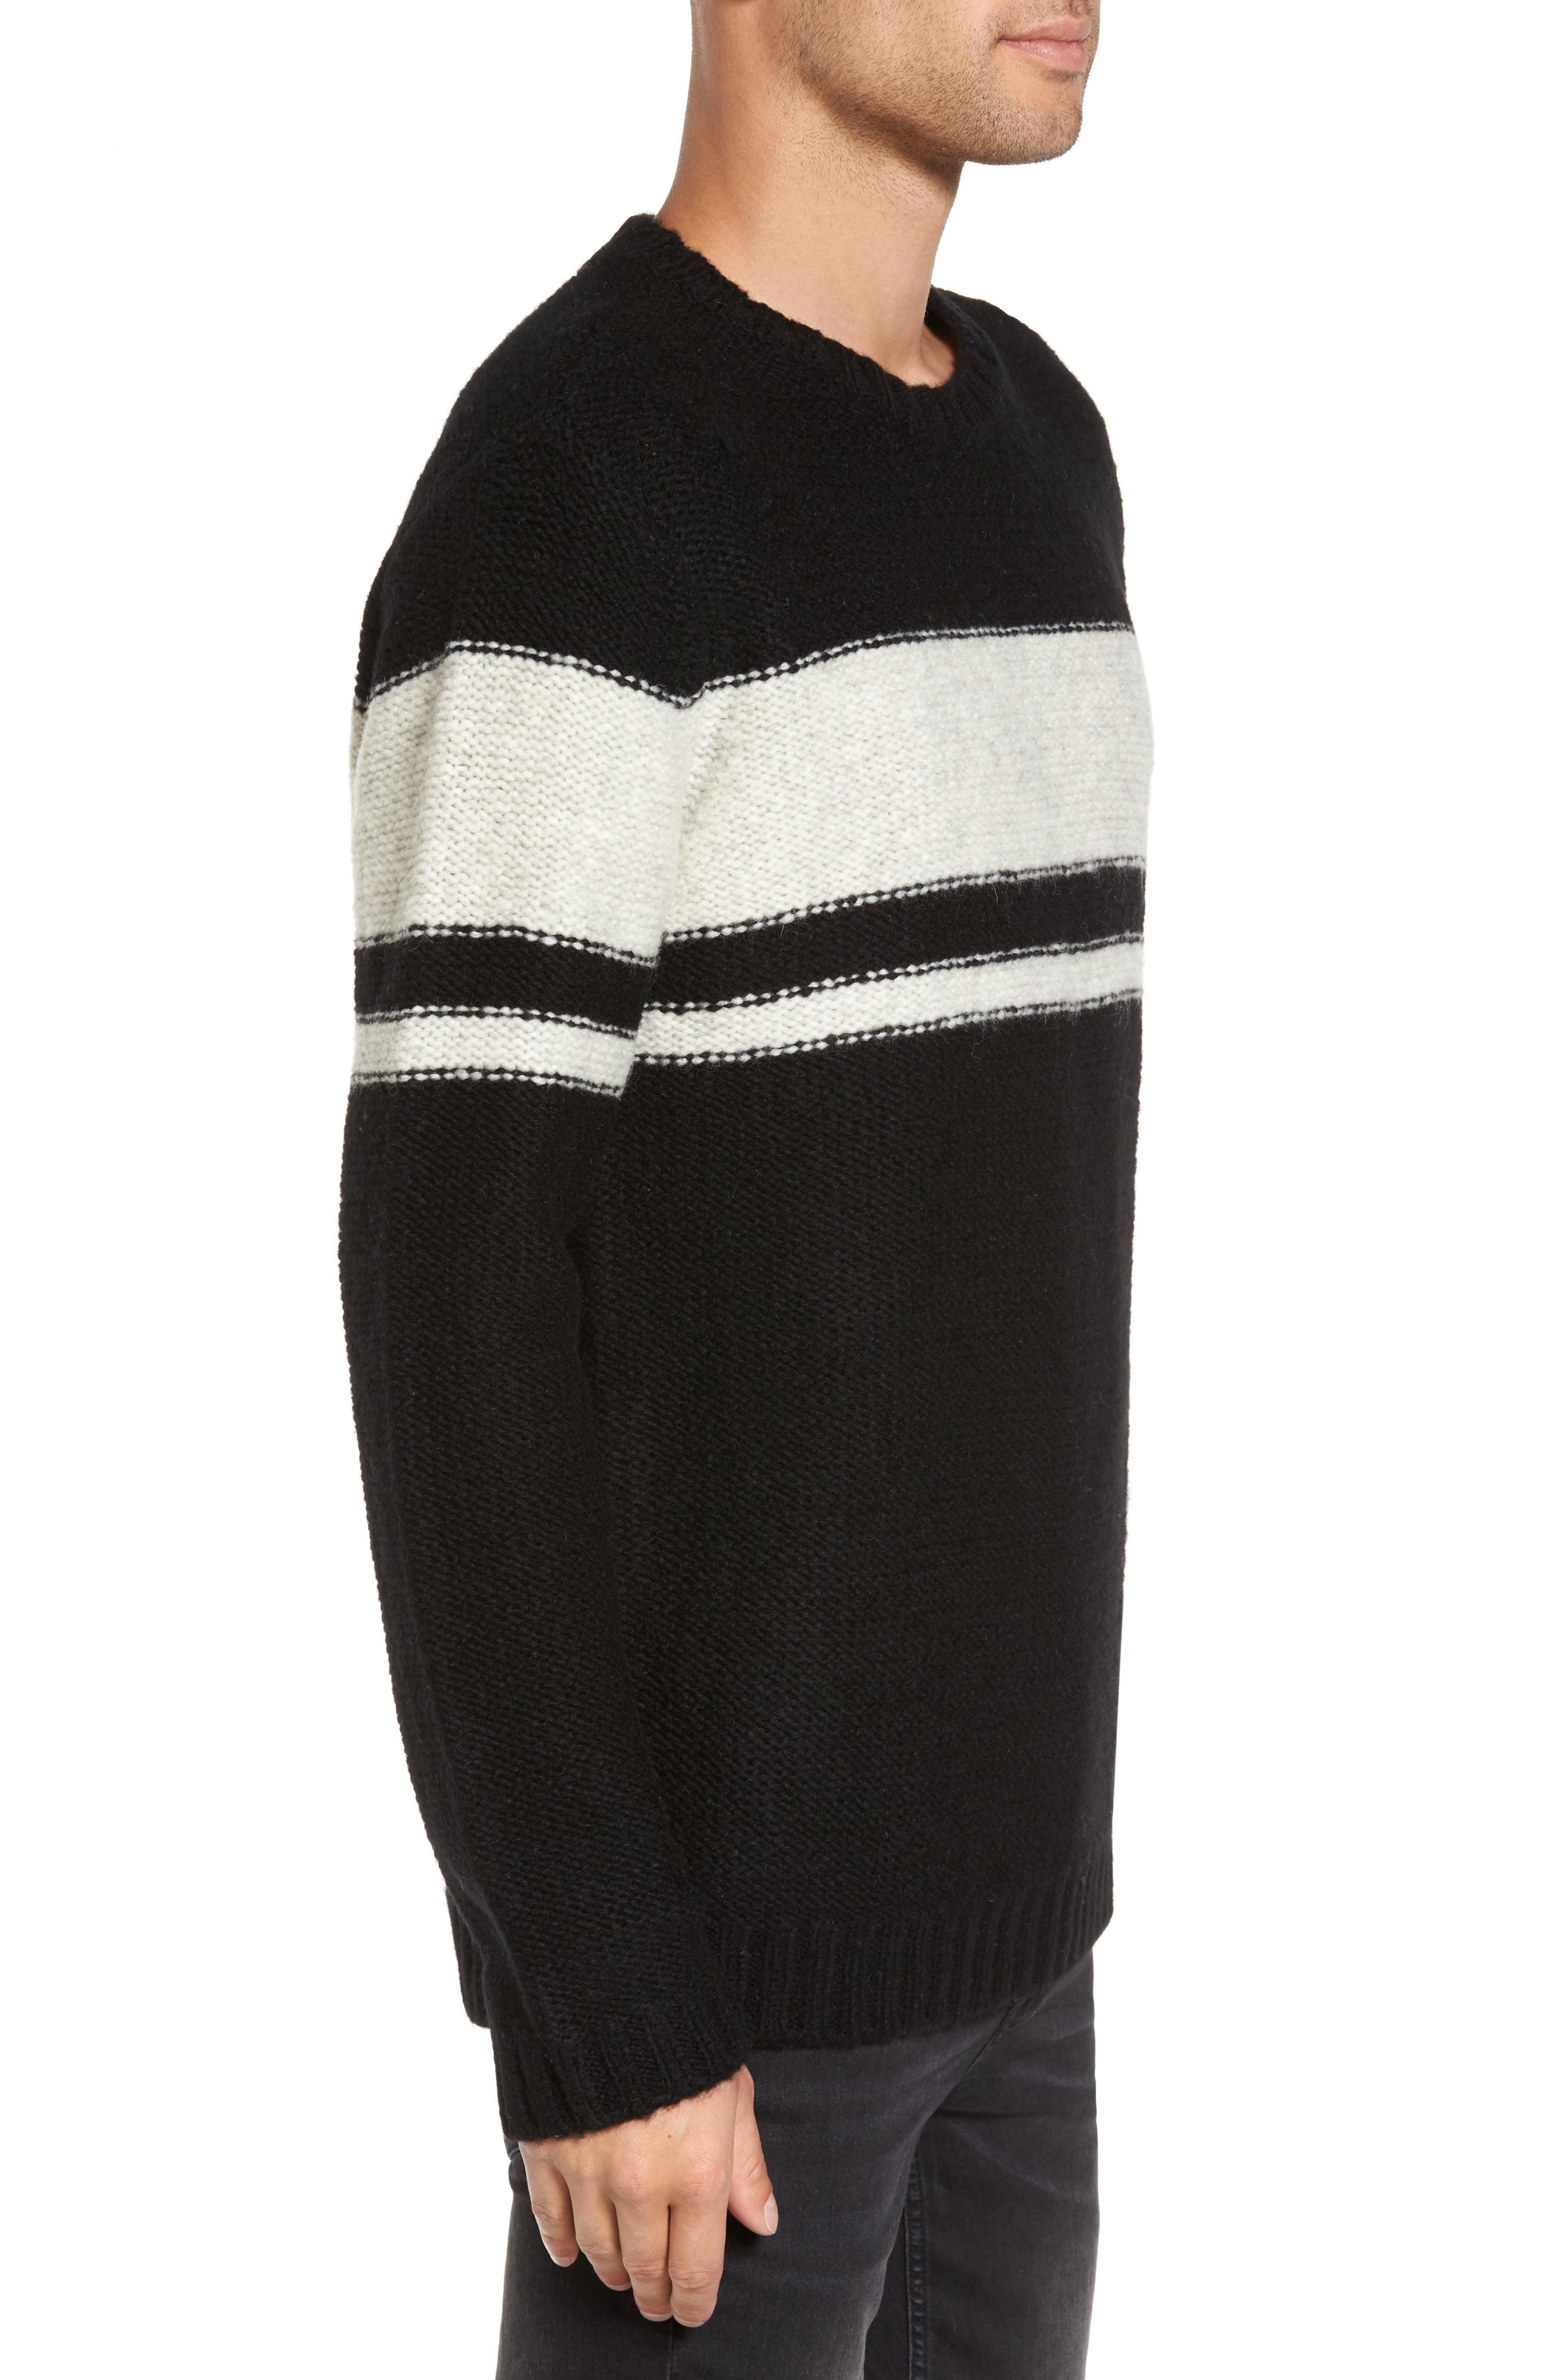 Blume Sweater,                             Alternate thumbnail 3, color,                             001